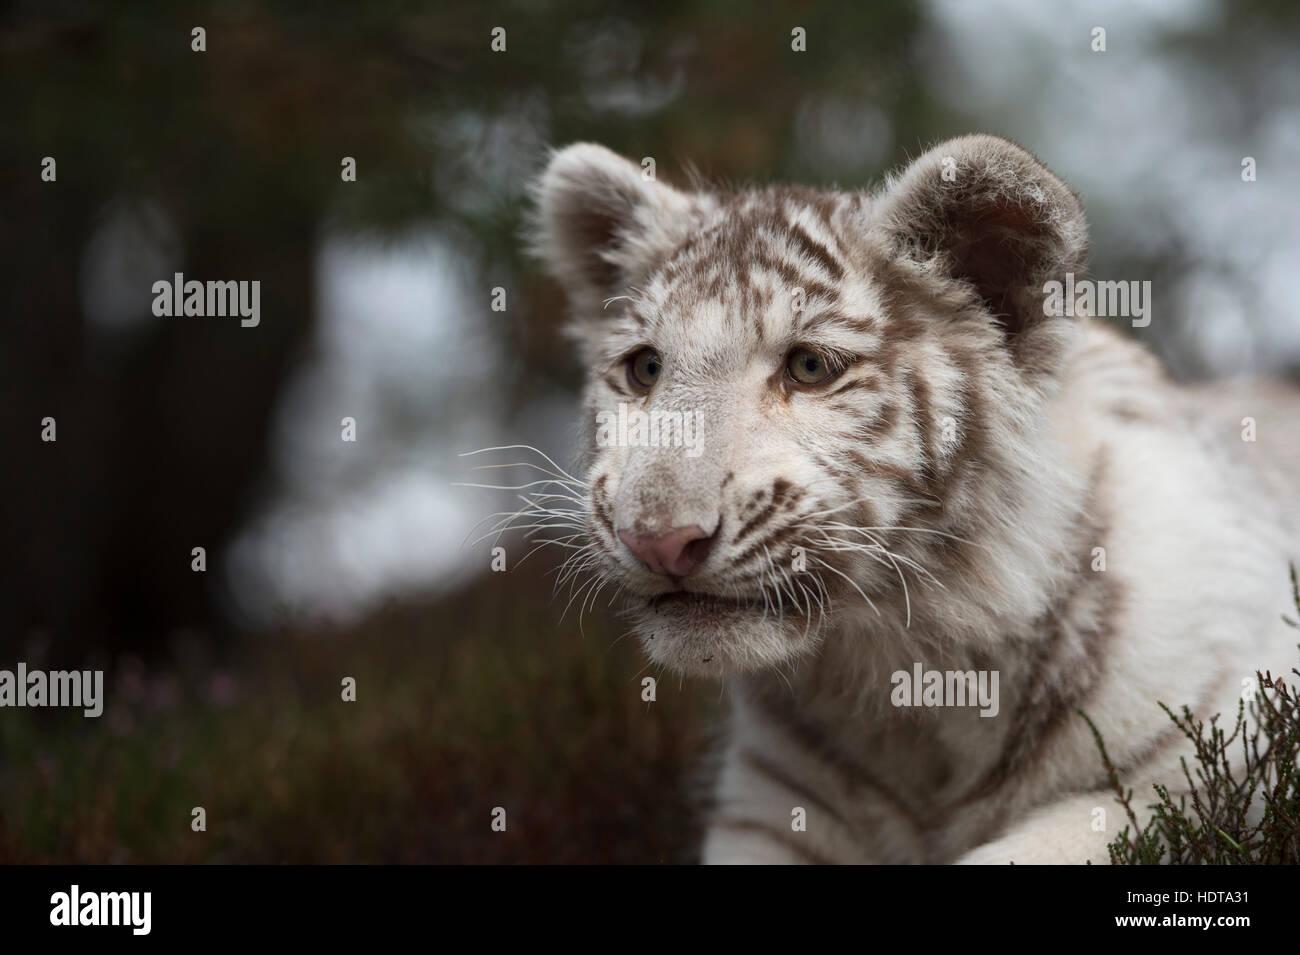 Royal Bengal Tiger / Koenigstiger ( Panthera tigris ), white morph, close-up, headshot, looks cunning, shifty, but - Stock Image